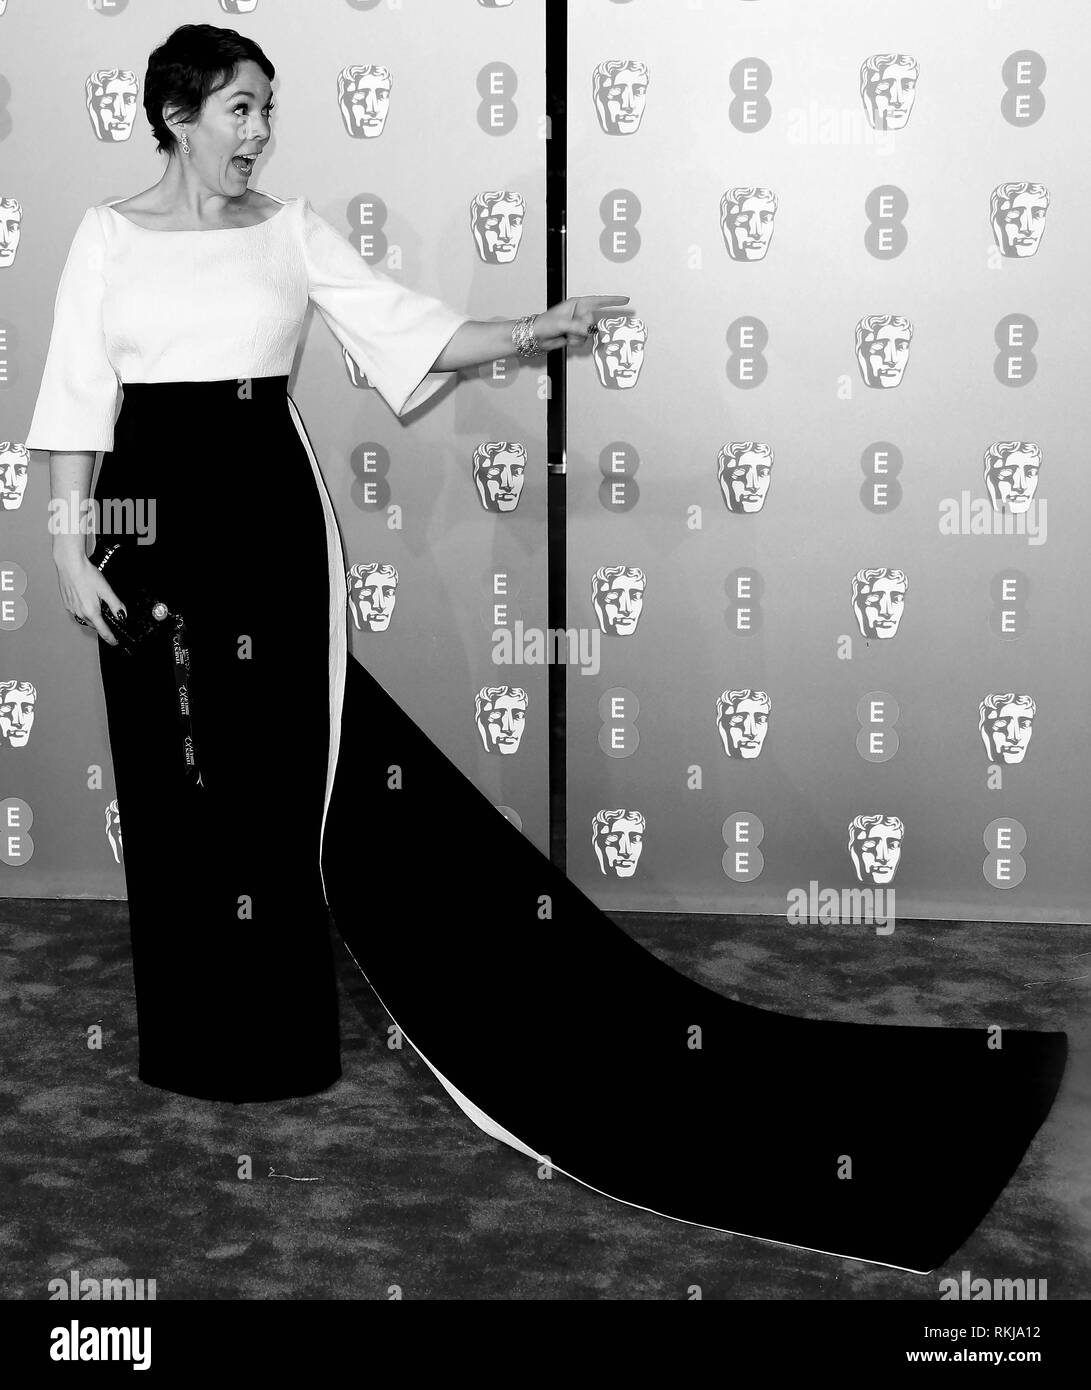 Feb 10, 2019 - Olivia Coleman an EE British Academy Film Awards 2019 - Alternative Ansicht, der Royal Albert Hall in London, Großbritannien Stockbild